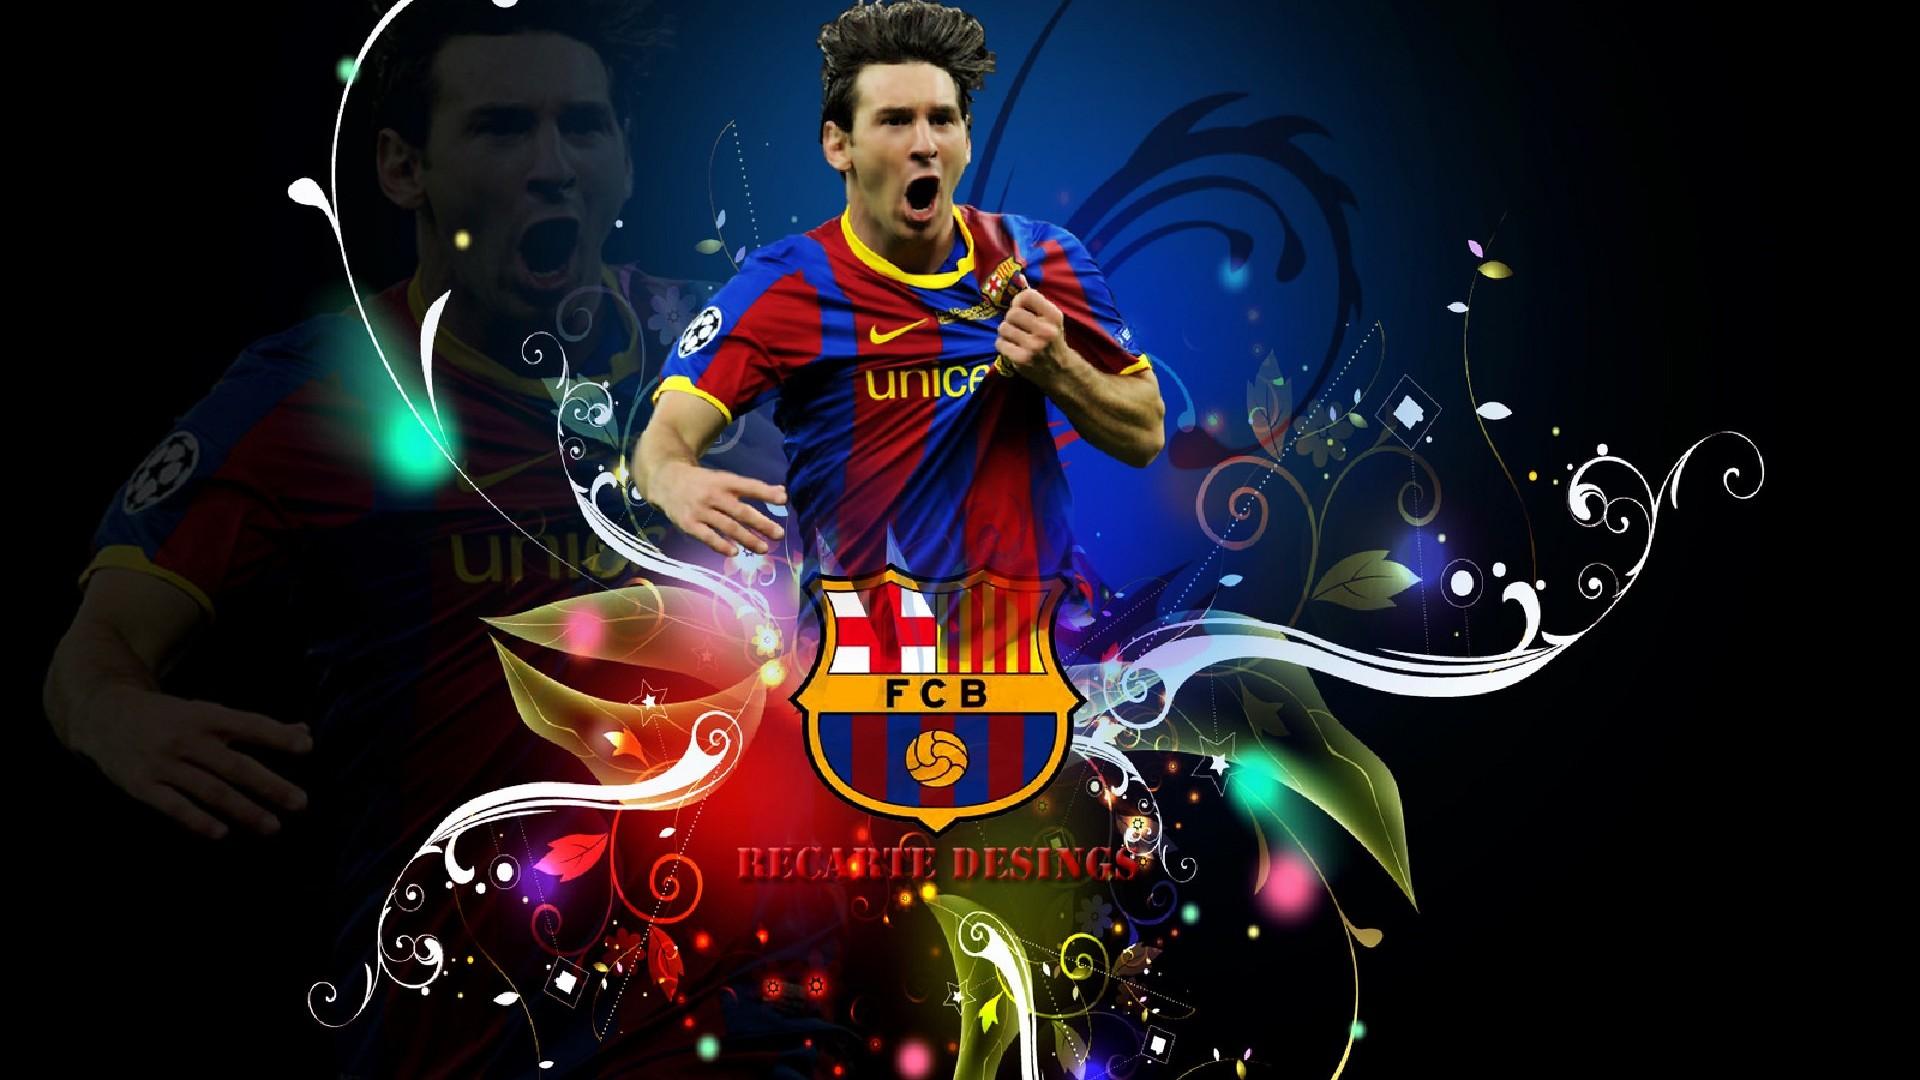 Messi barcelona wallpaper free download messi barcelona wallpaper voltagebd Choice Image